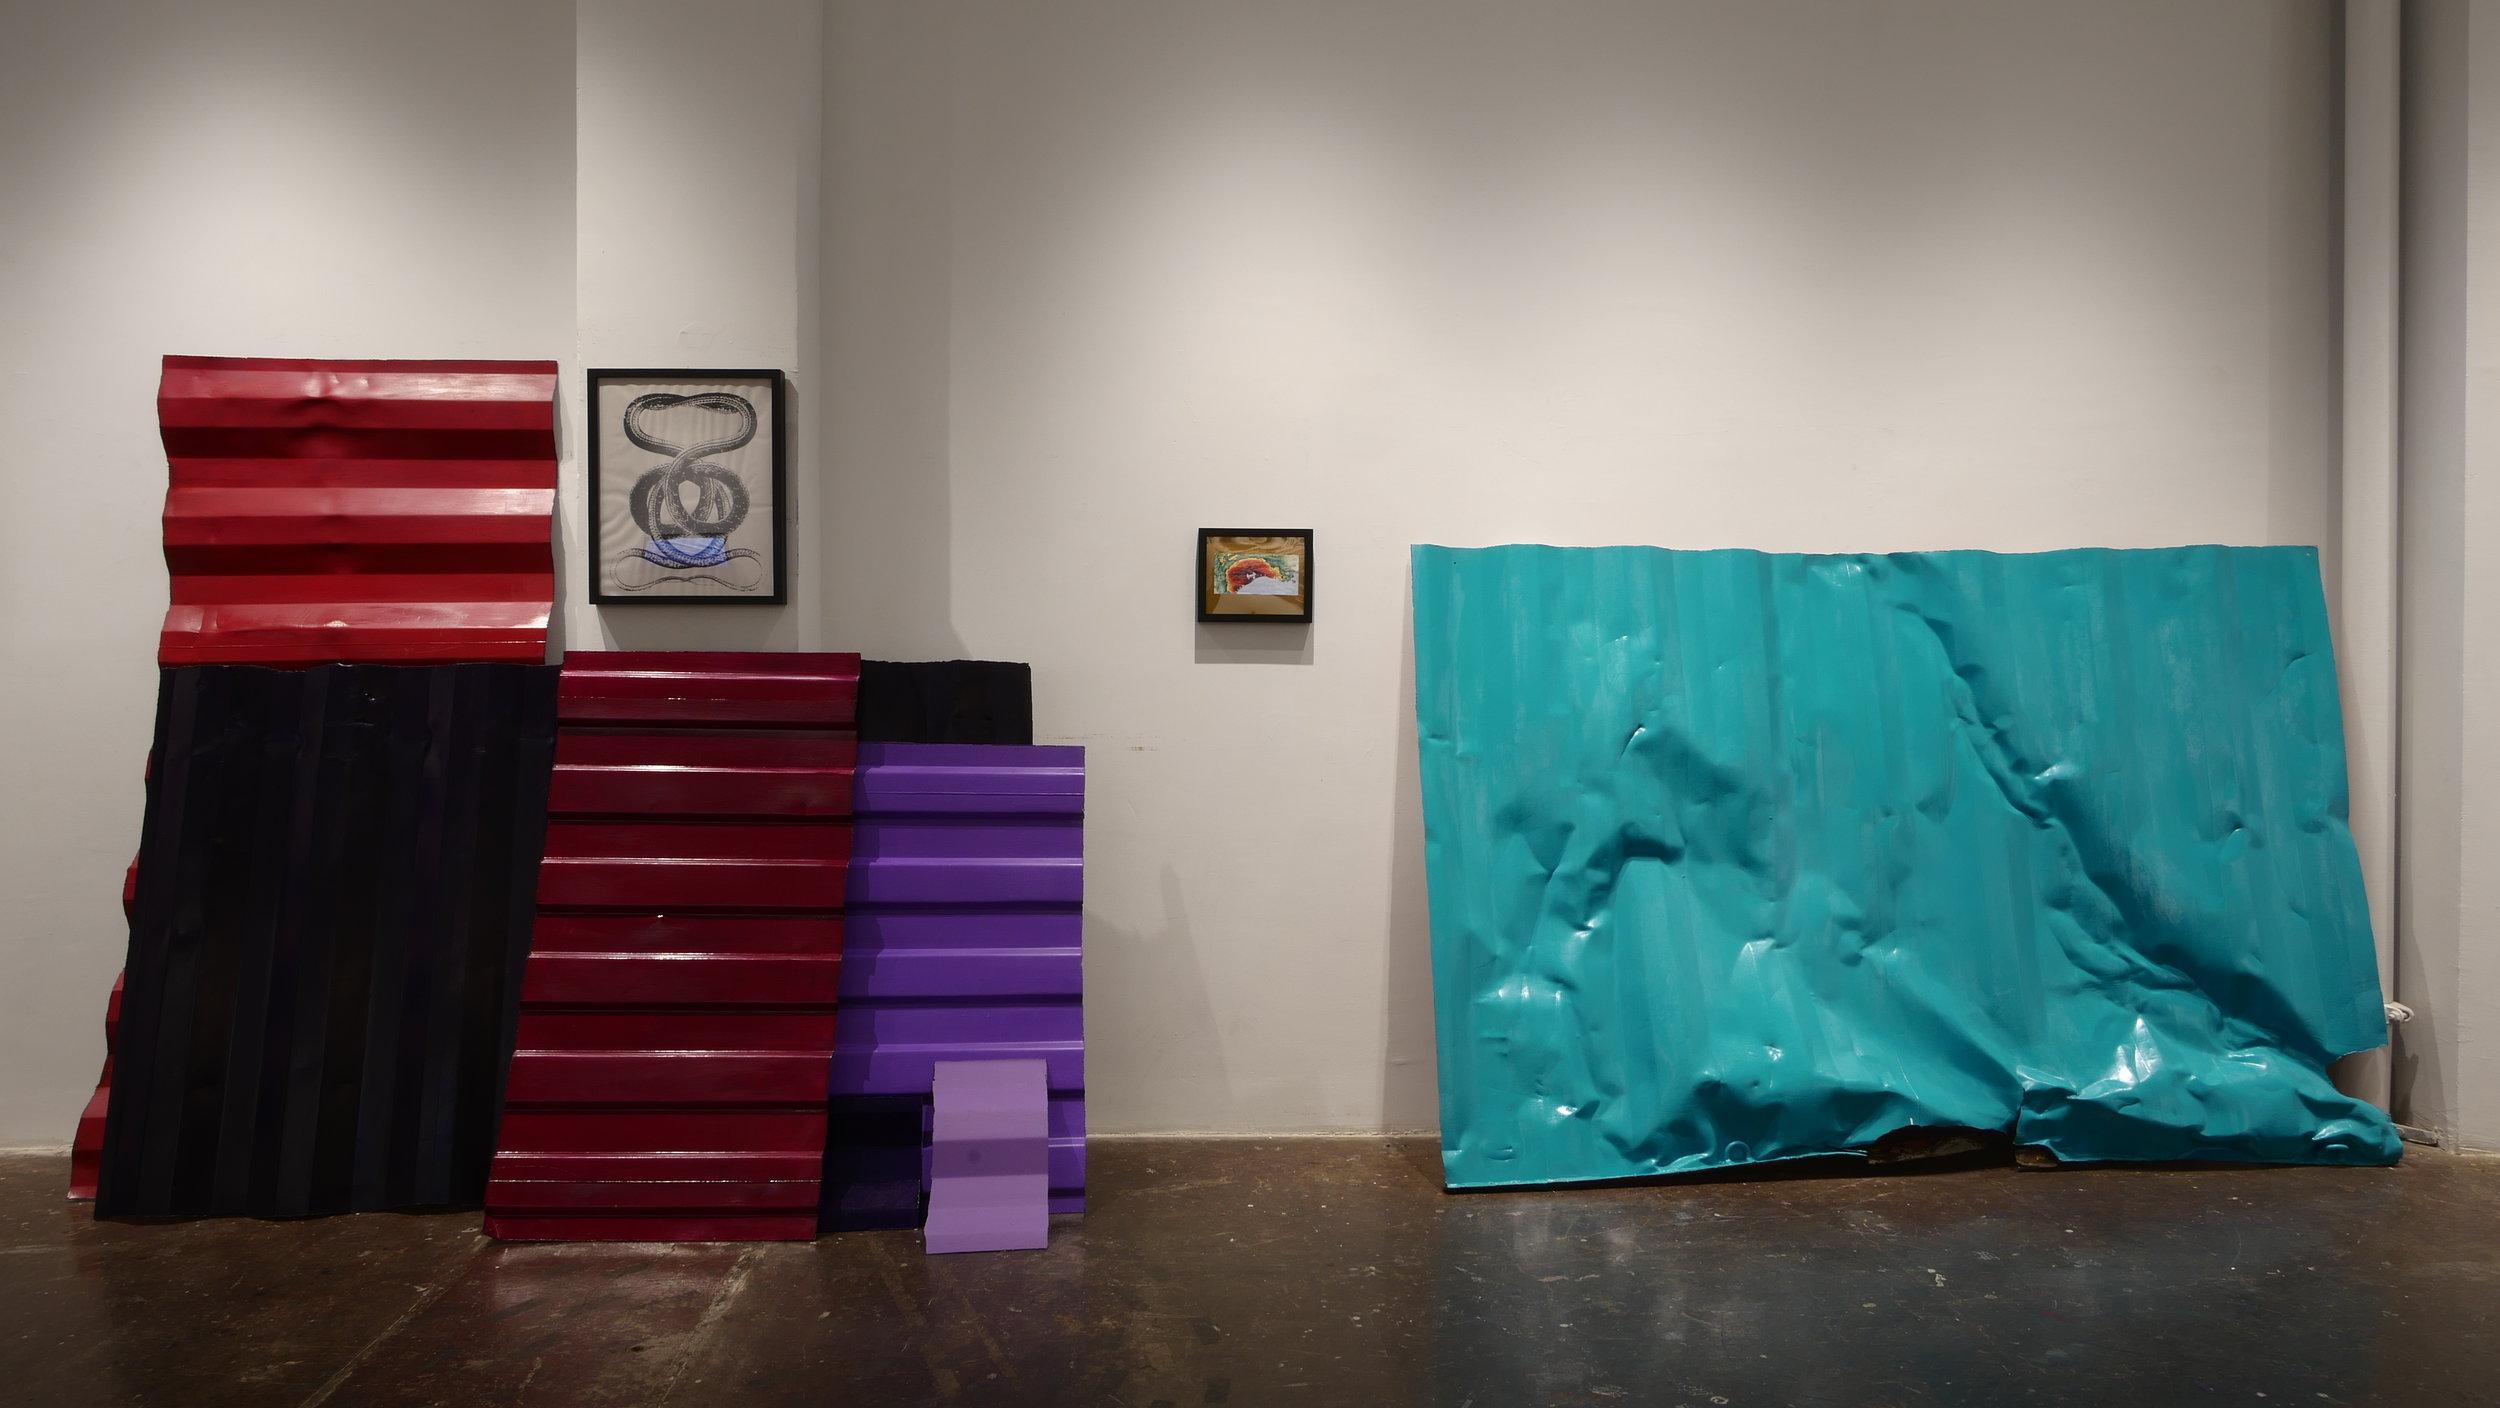 4_the_purple_wall.JPG